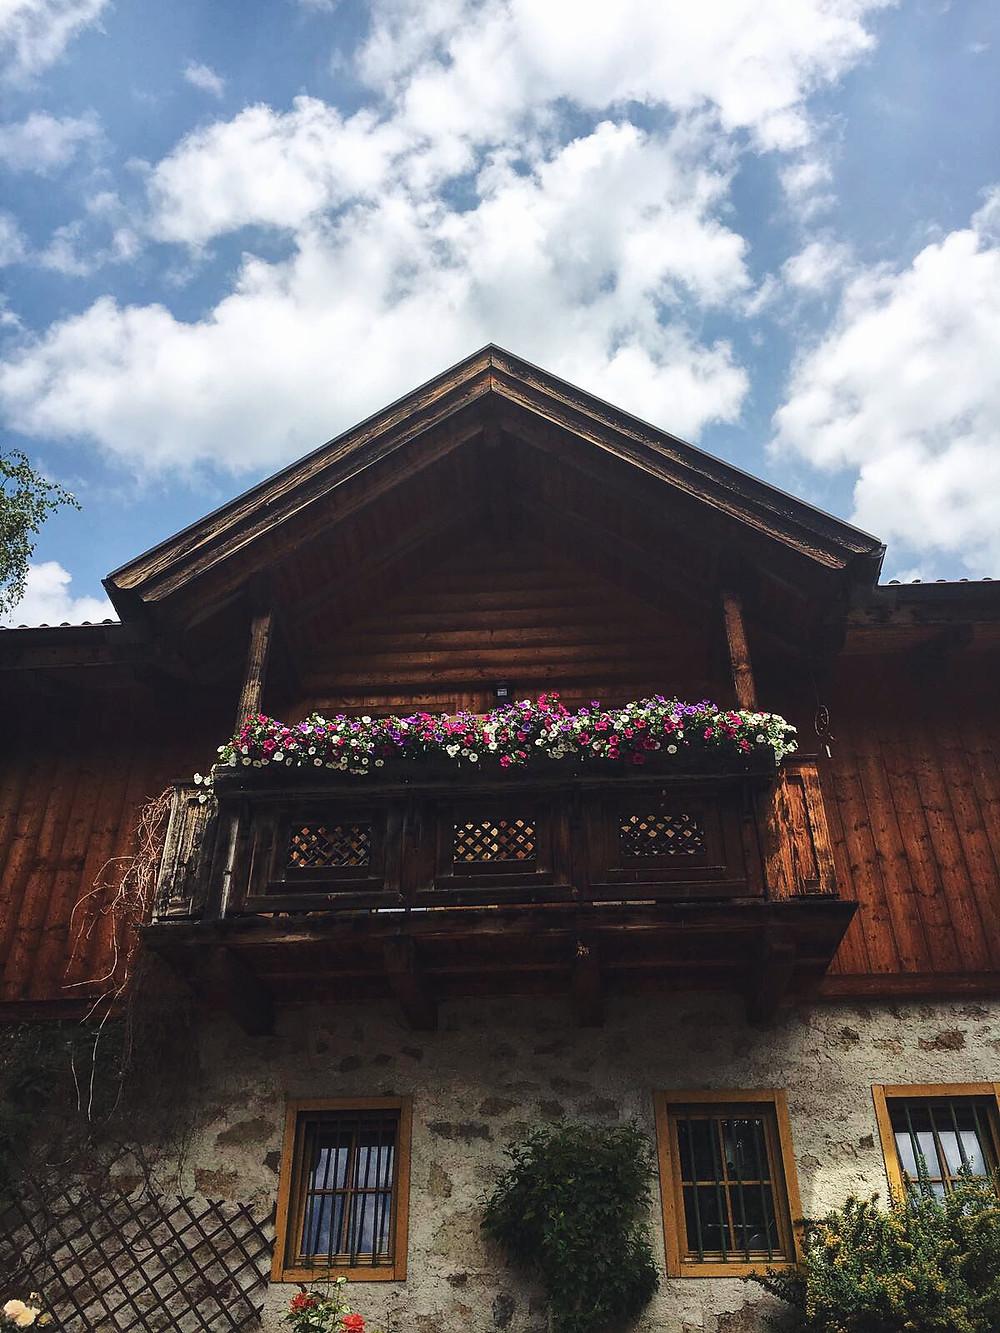 Patscheider Hof in Post Oberbozen Tirol